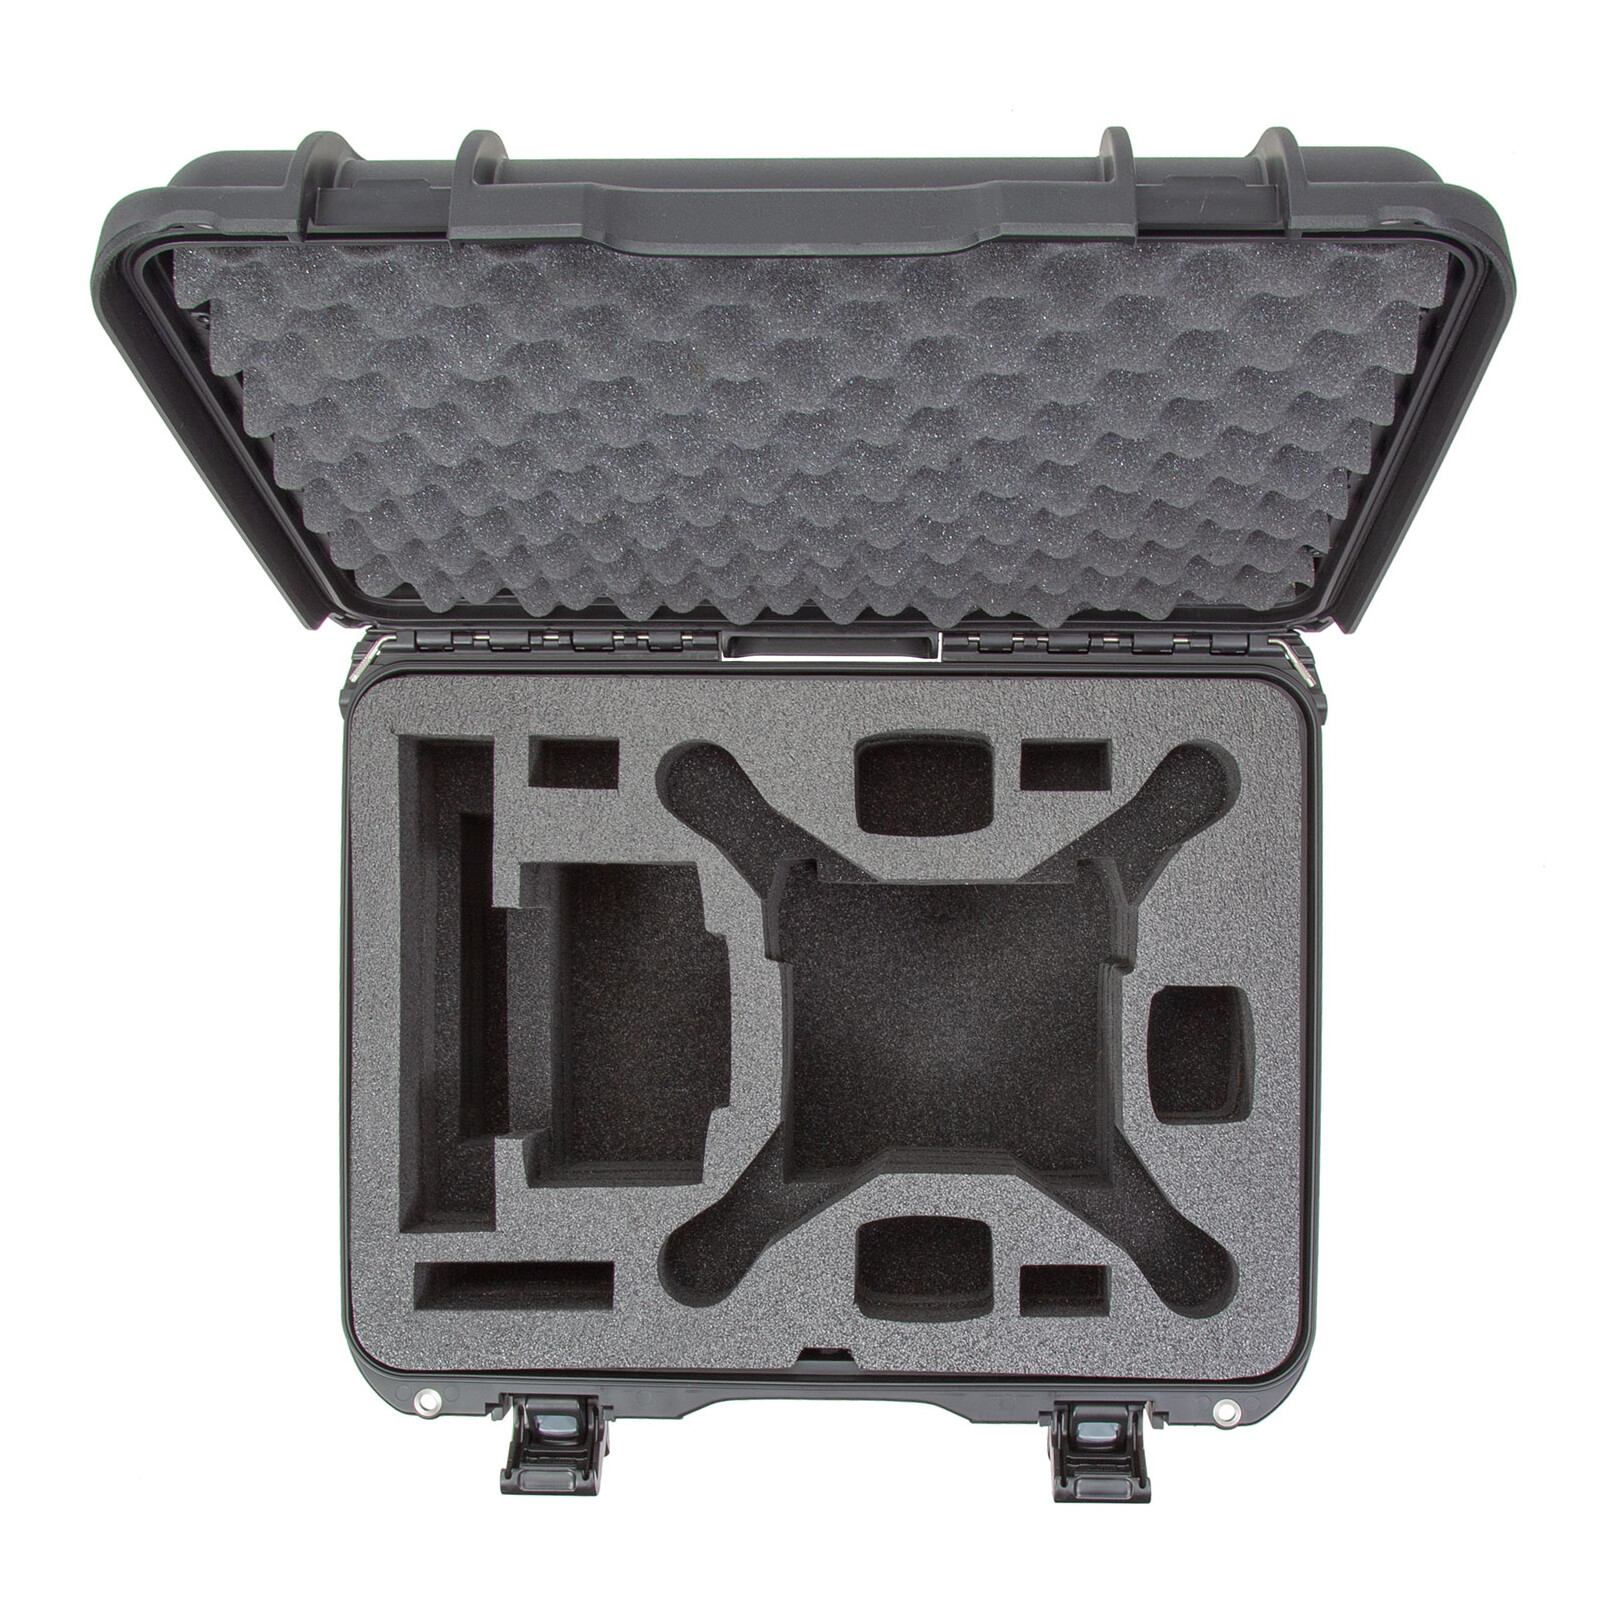 Nanuk Case 933 black f. DJI P4